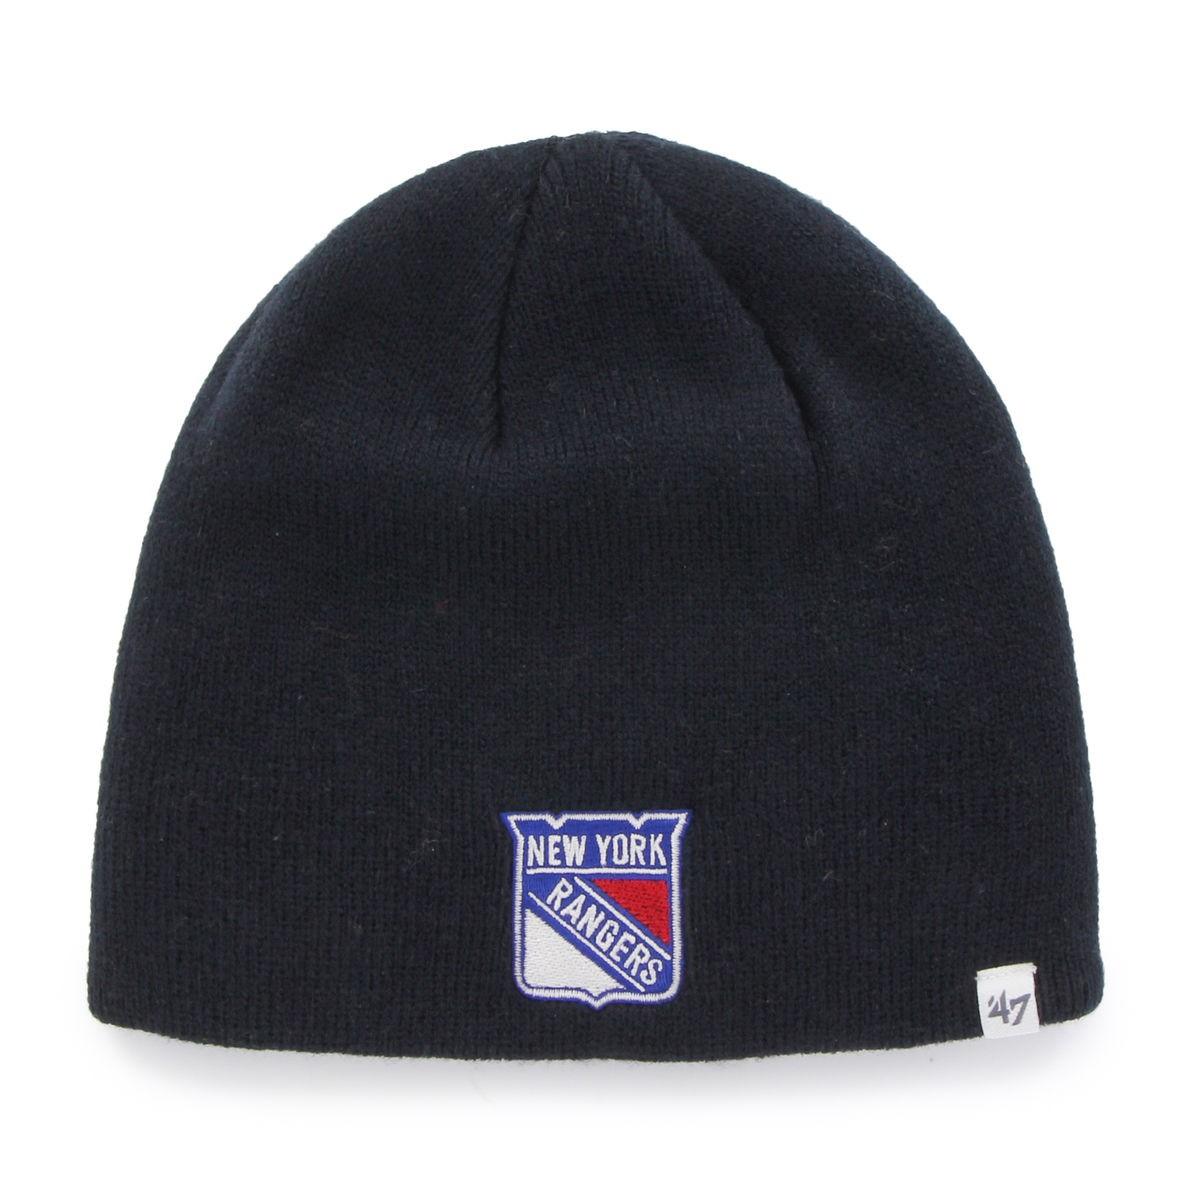 BRAND 47 New York Rangers Beanie Winter Hat